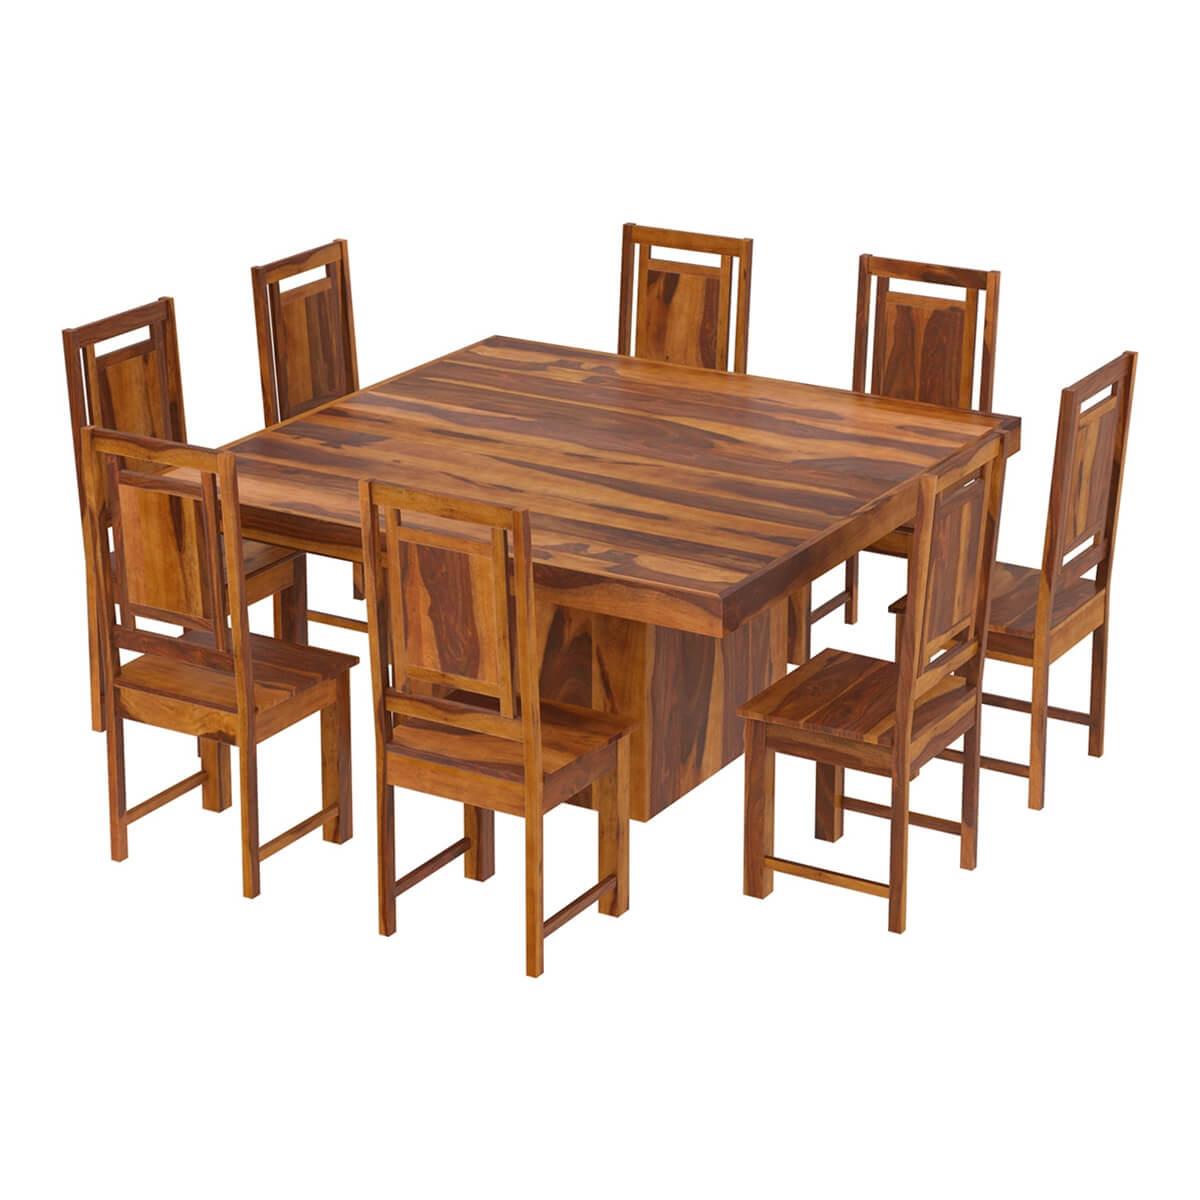 Brocton Solid Wood Square Pedestal 10 Piece Dining Room Set